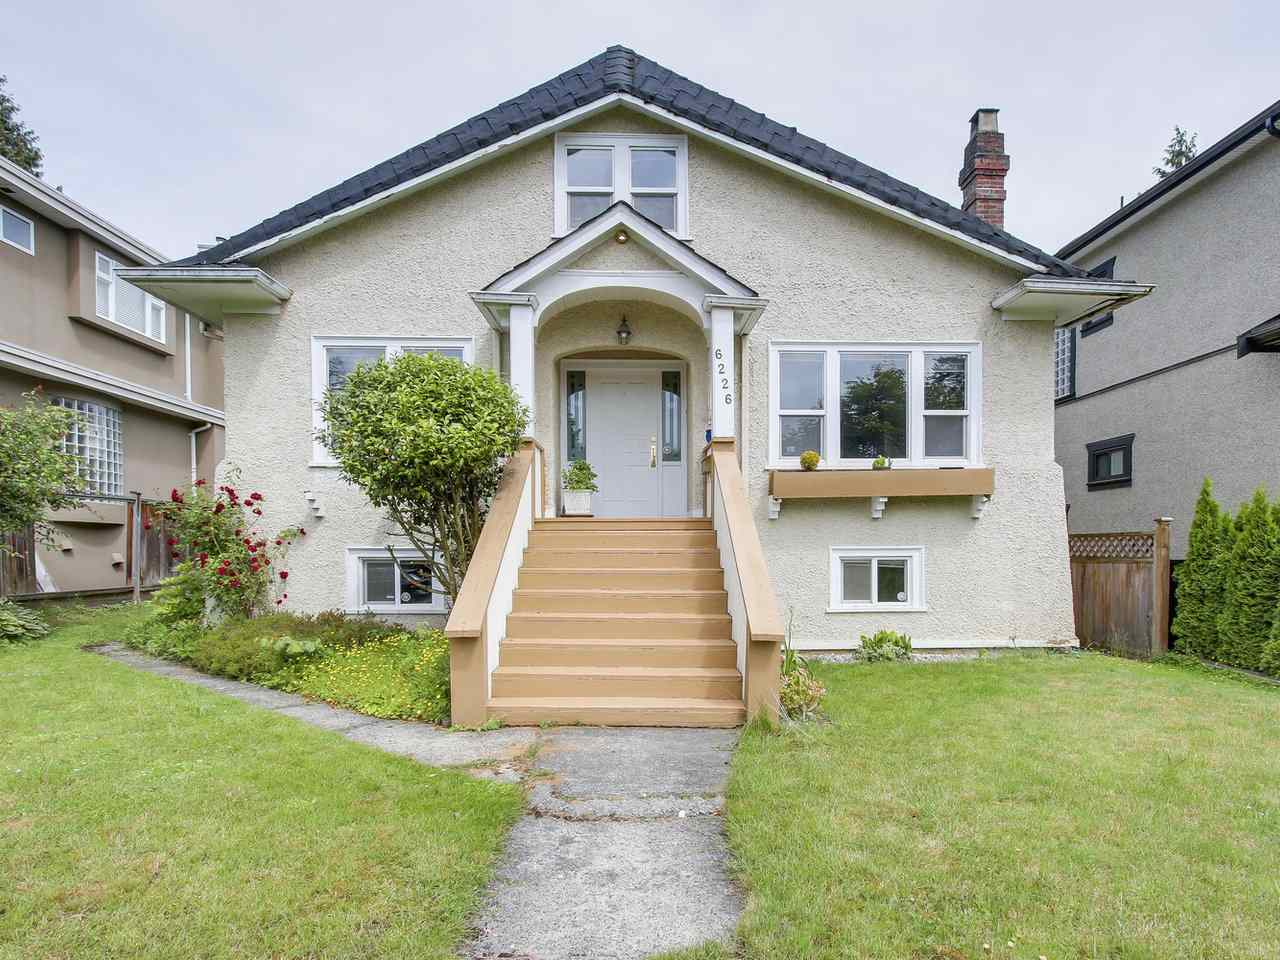 Detached at 6226 VINE STREET, Vancouver West, British Columbia. Image 2